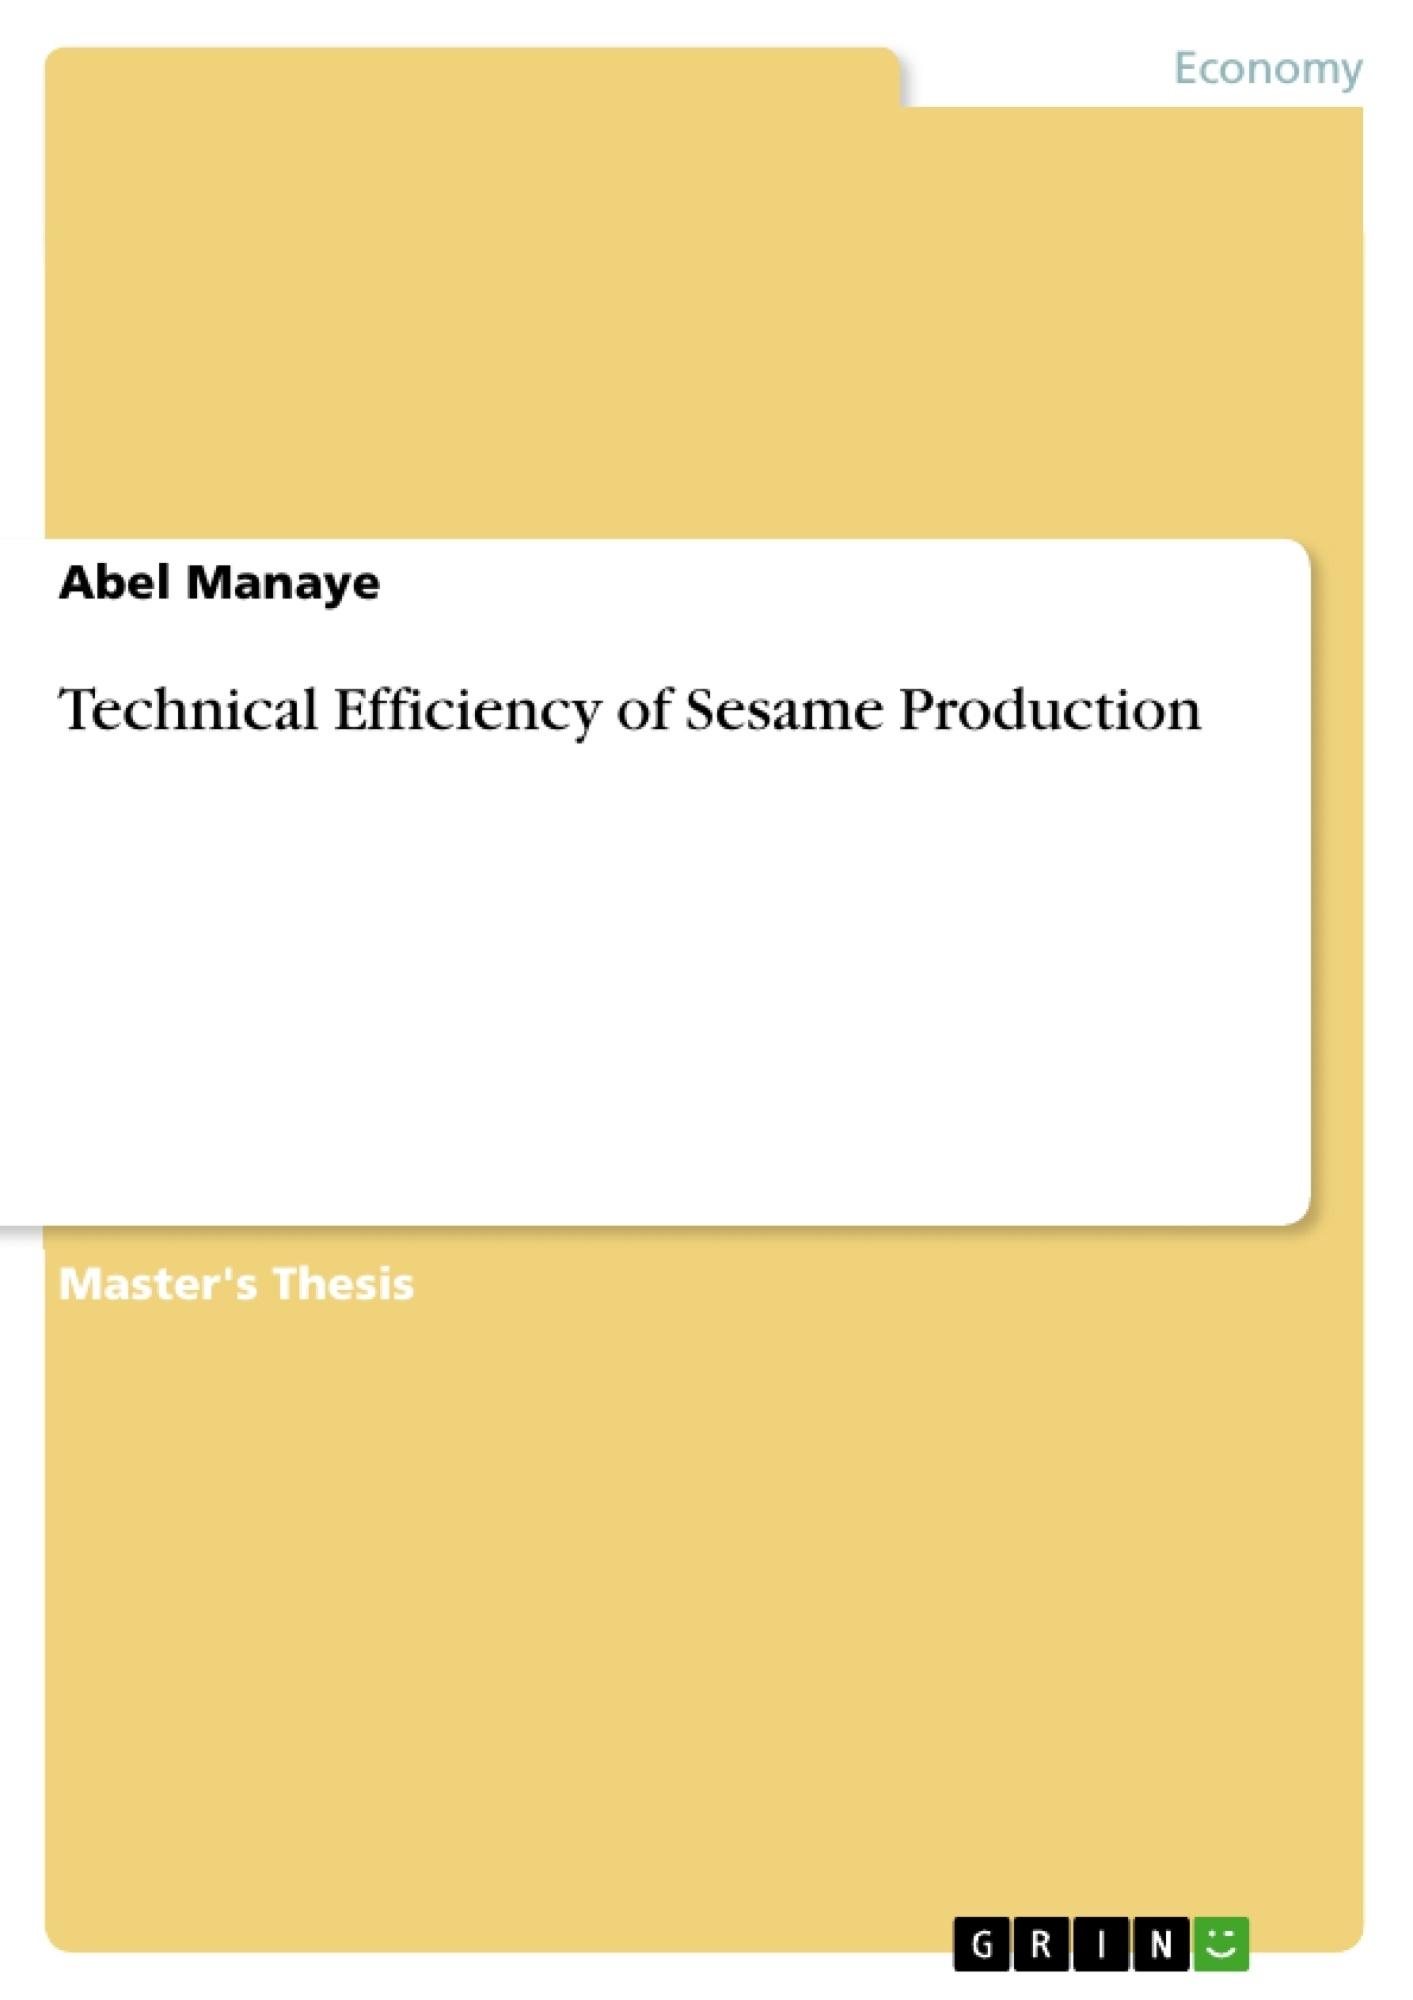 maisha eggers dissertation